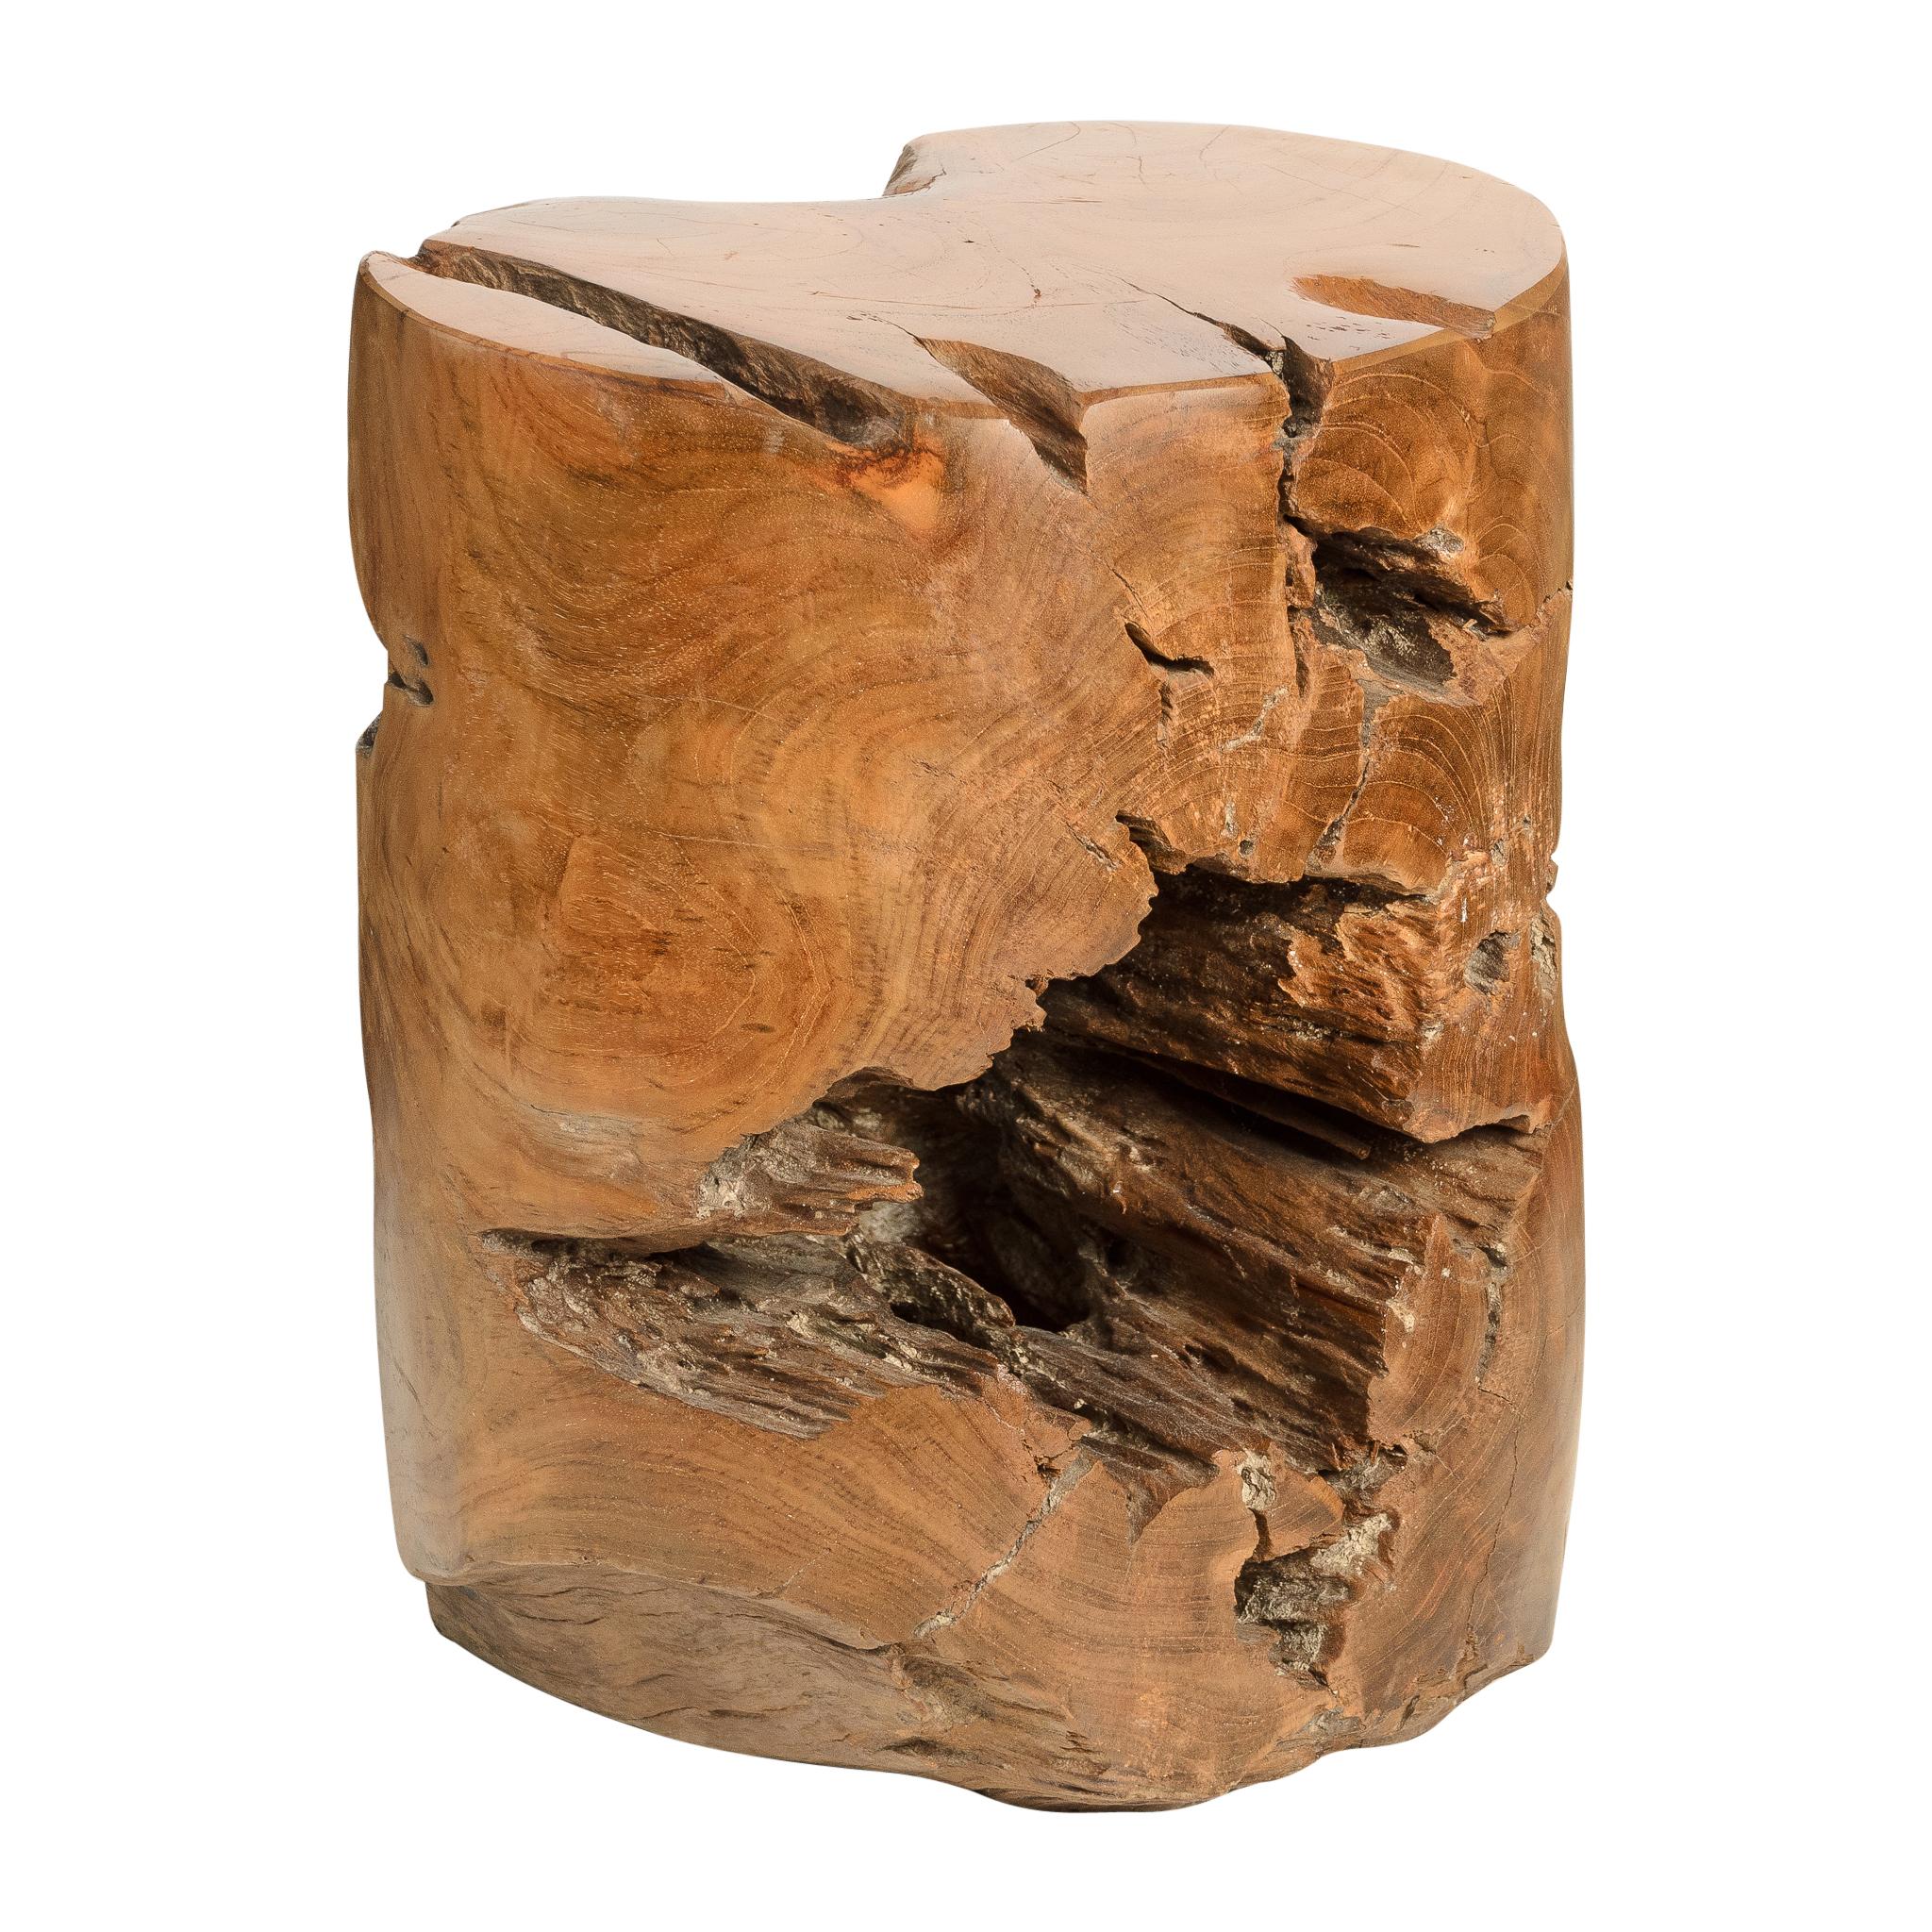 Astounding Solid Teak Garden Stool Side Table Decorative Sculptural Ncnpc Chair Design For Home Ncnpcorg